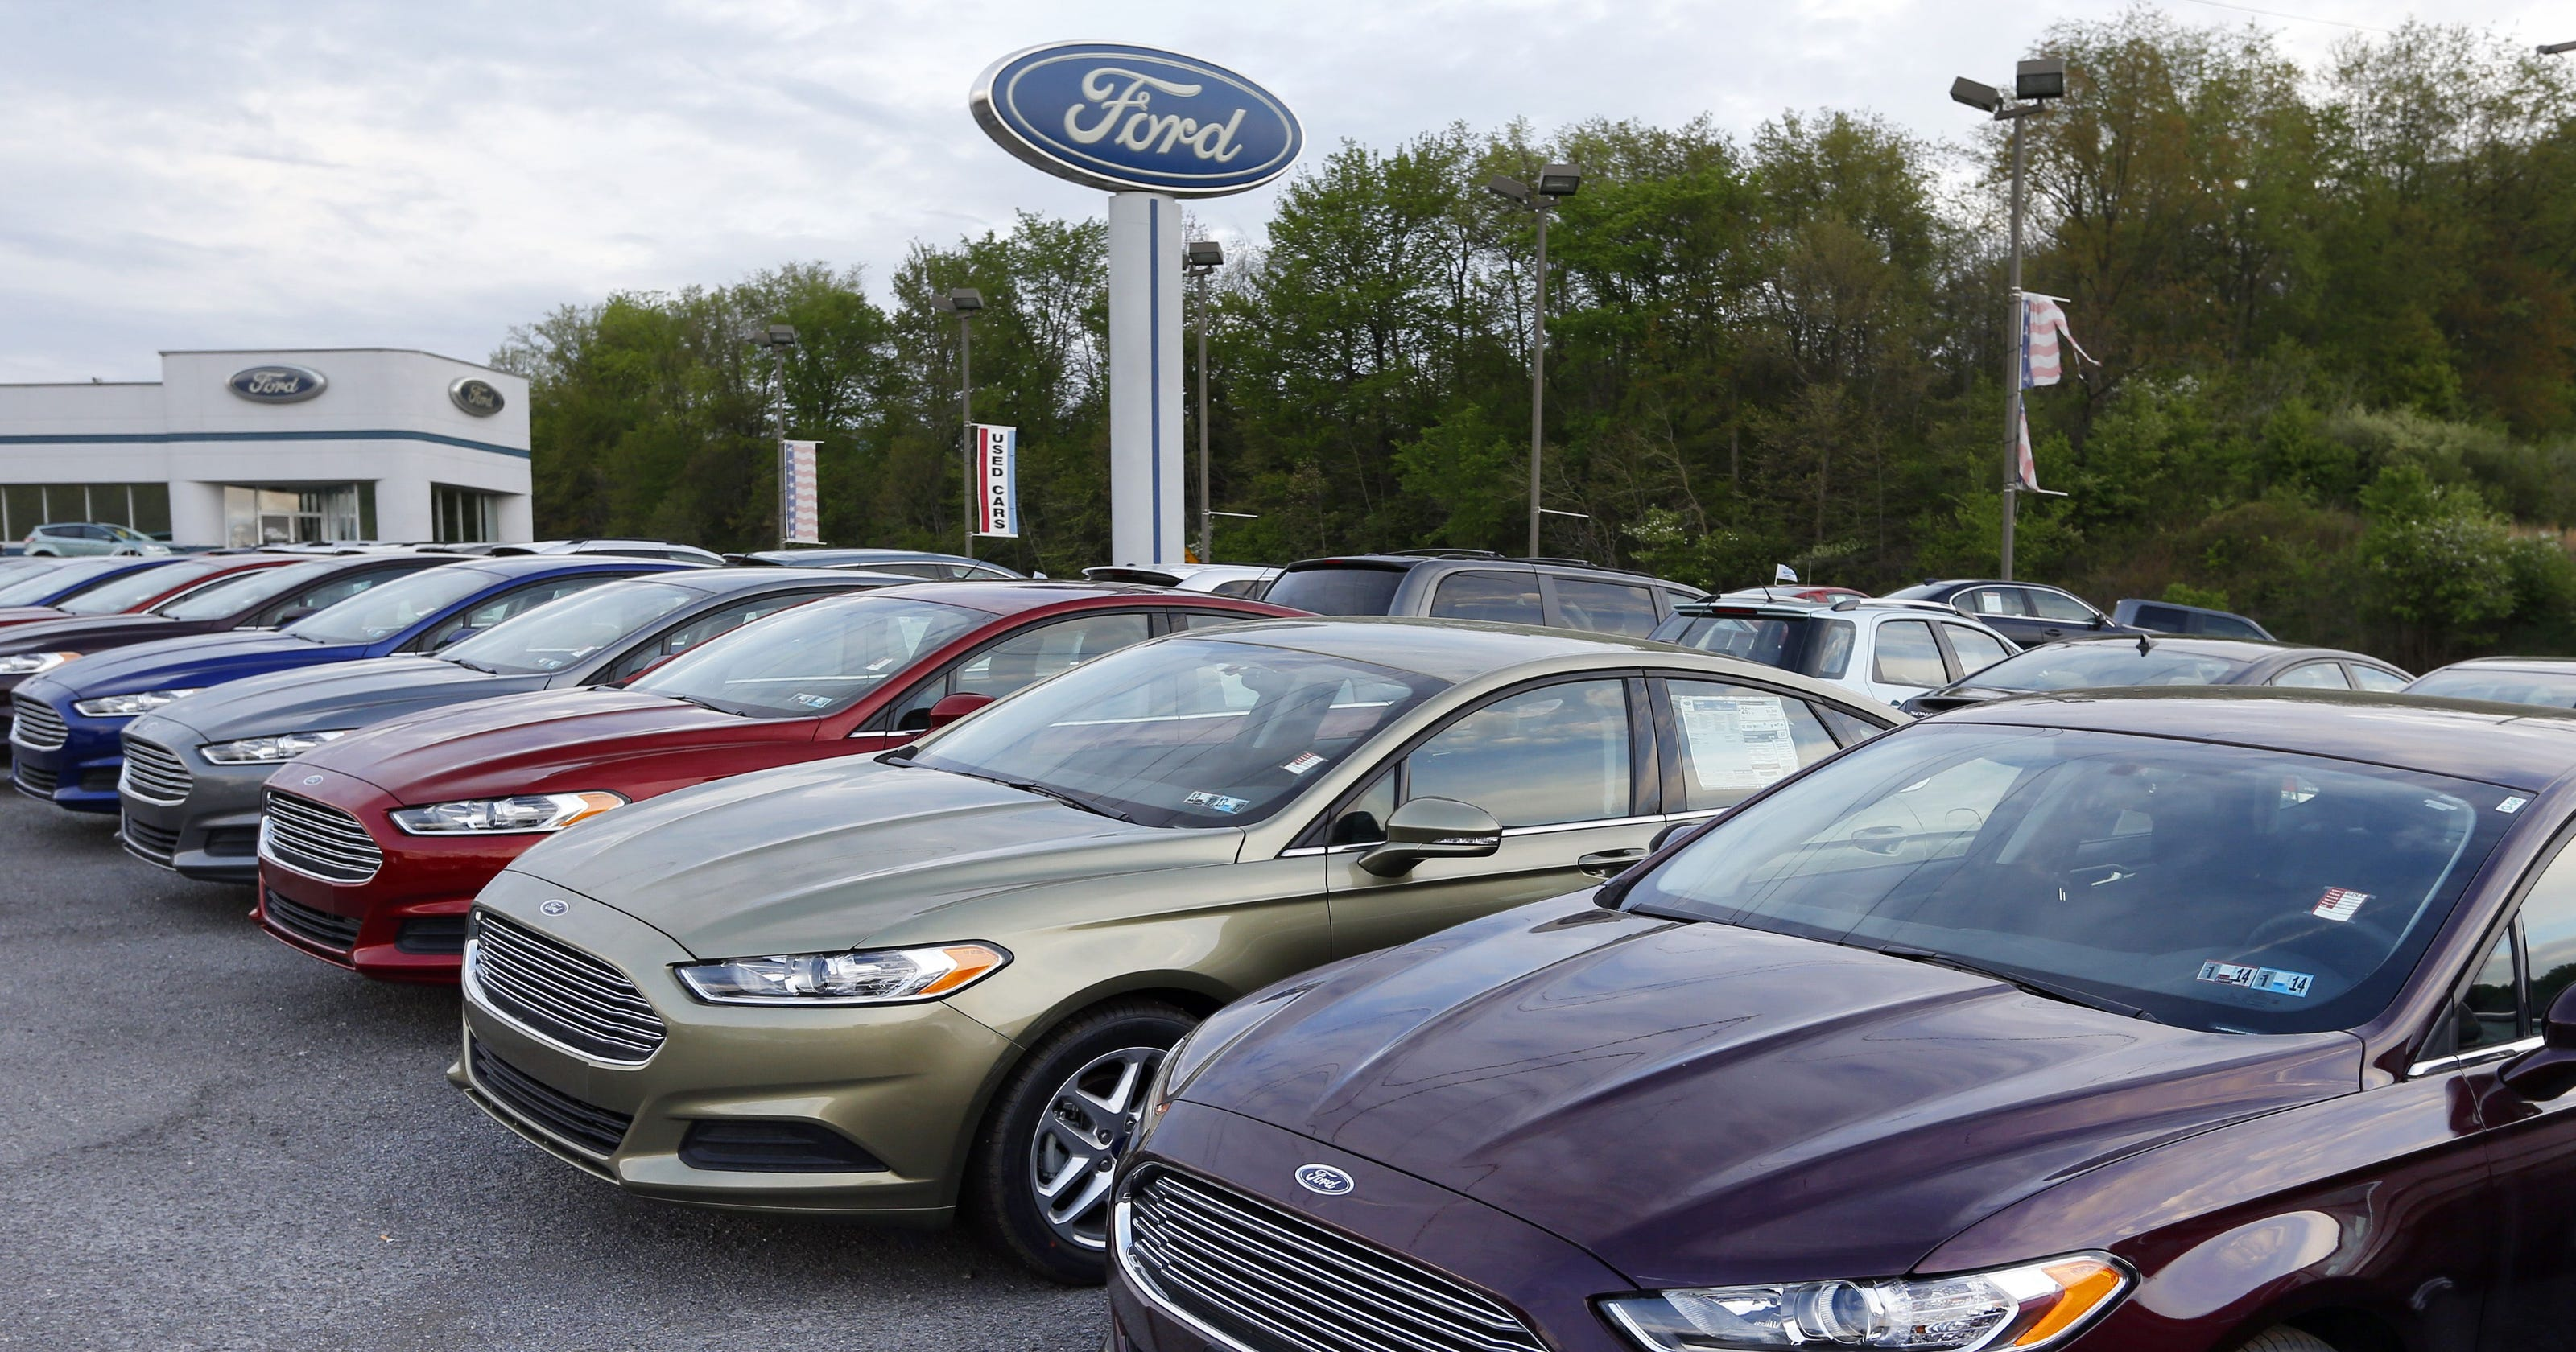 U S Auto Sales Record Streak Snapped In 2017